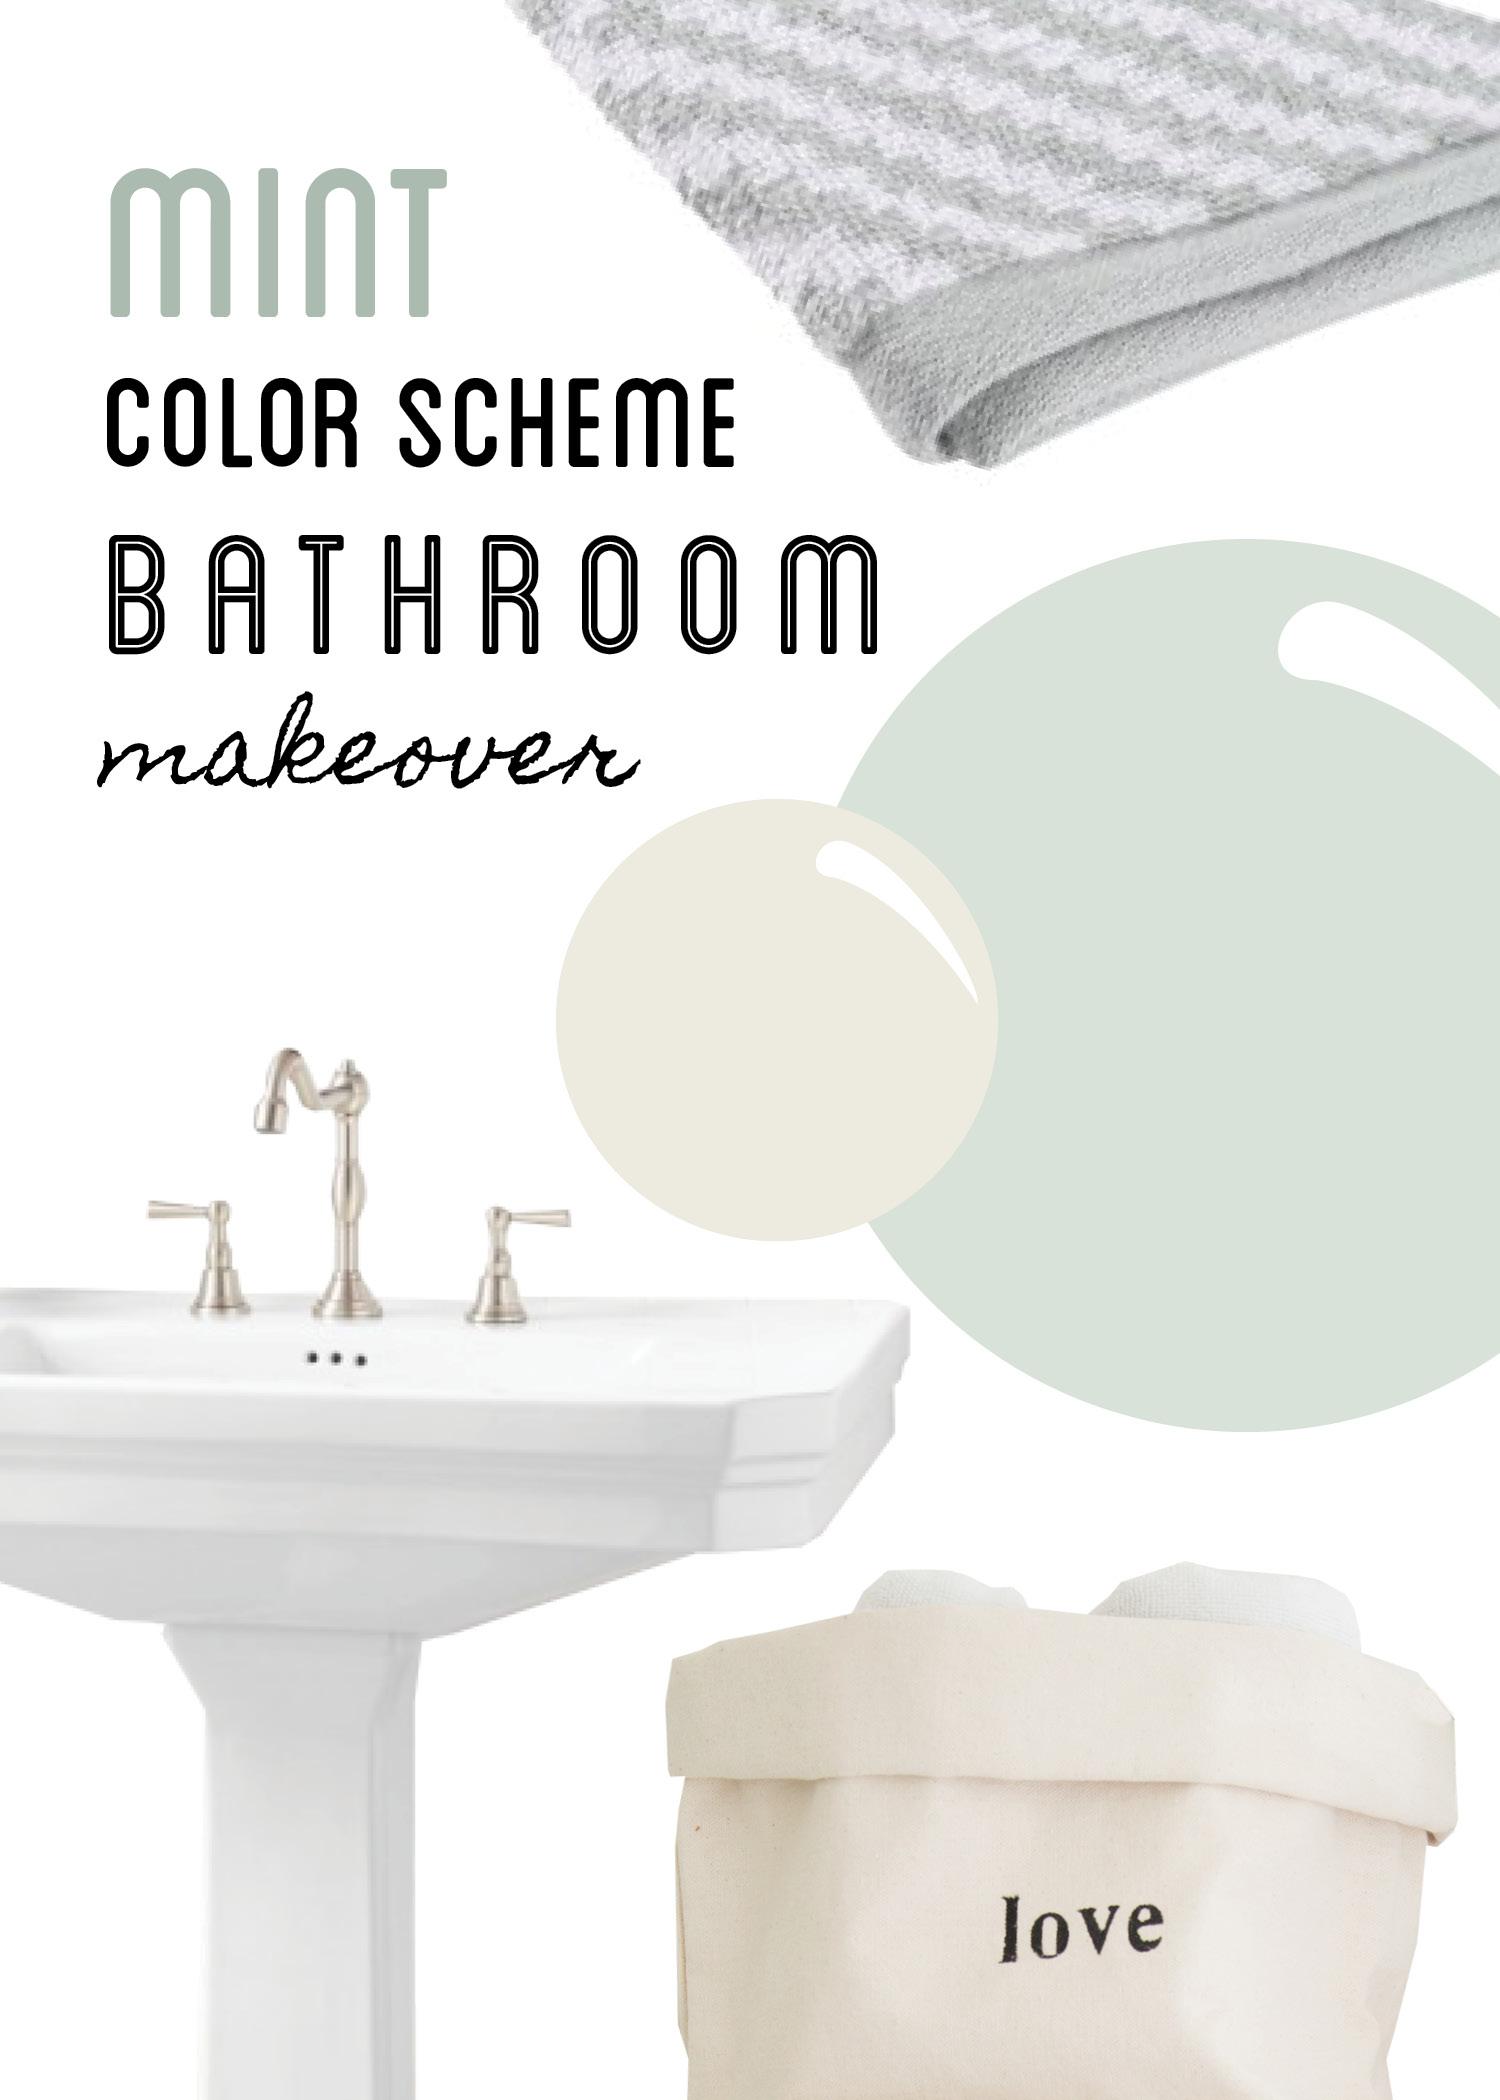 Mint Color Bathroom Design